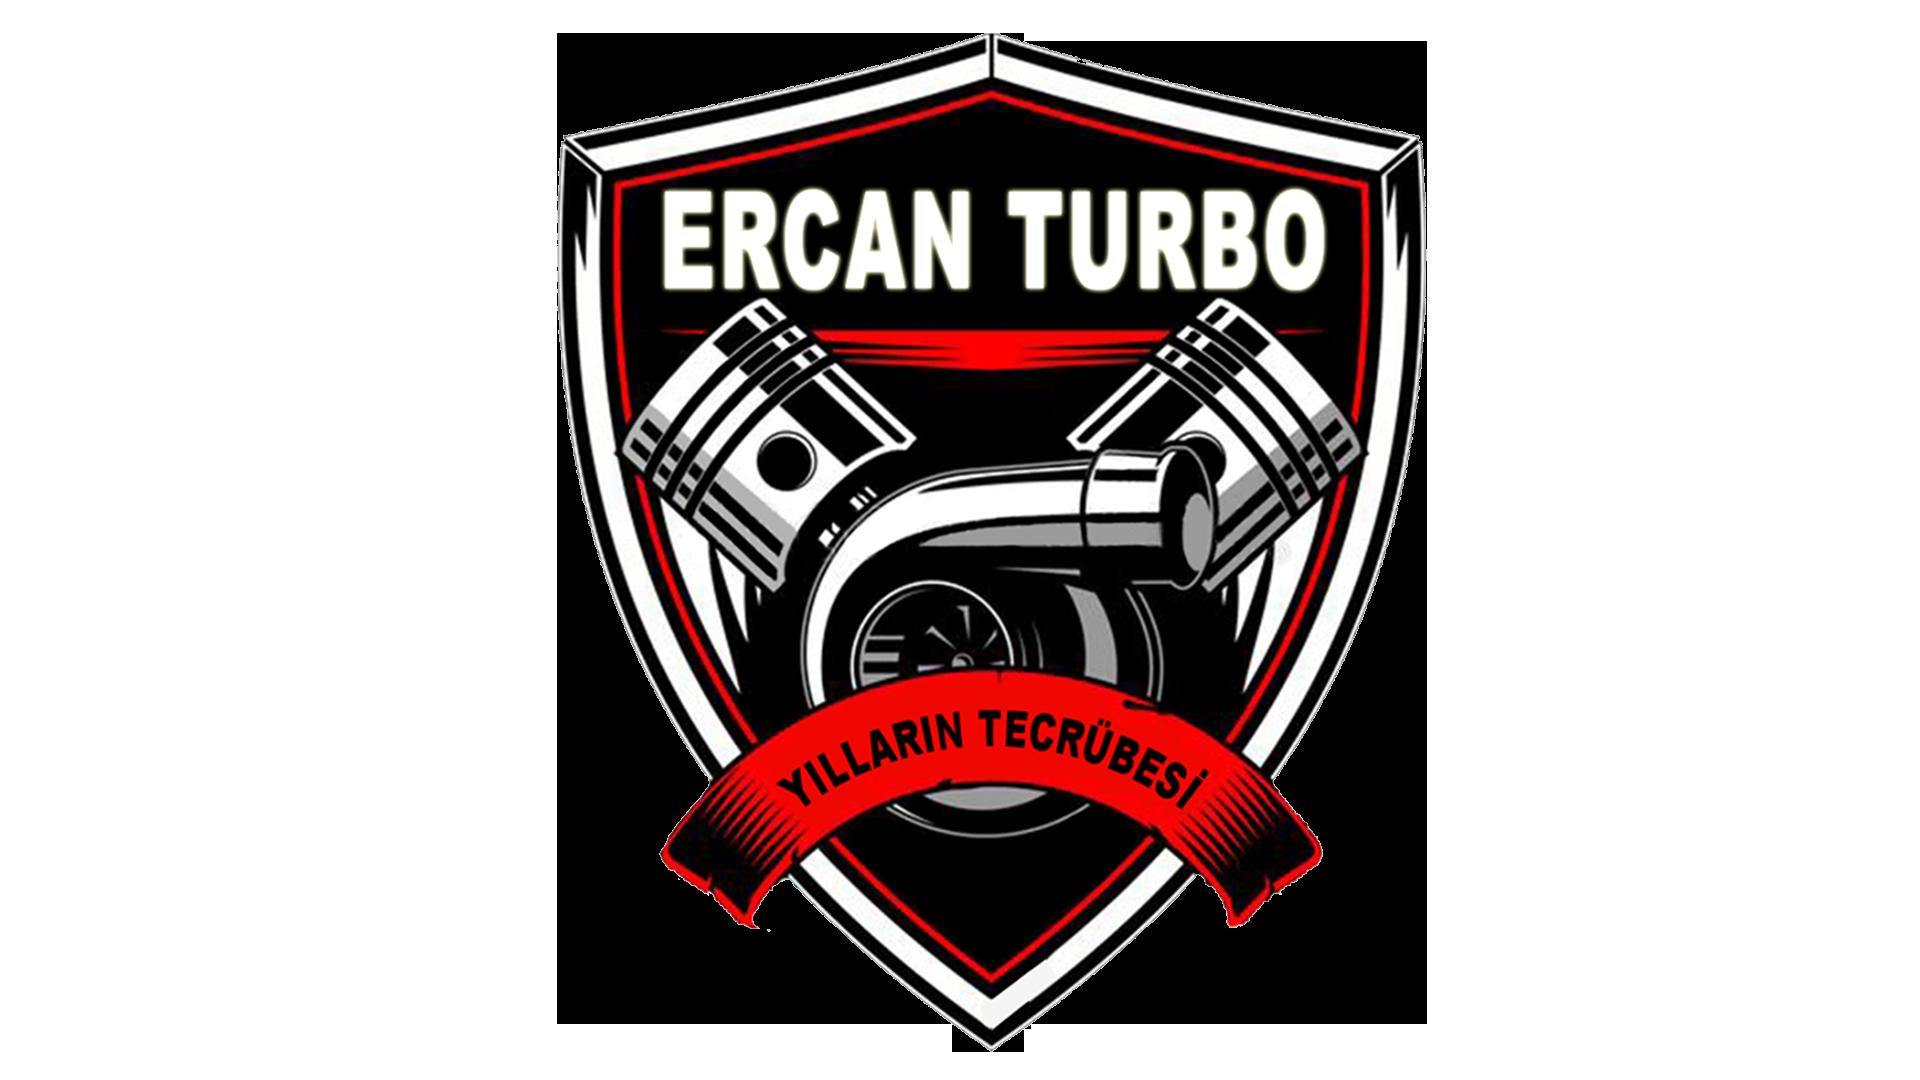 sinop turbocu